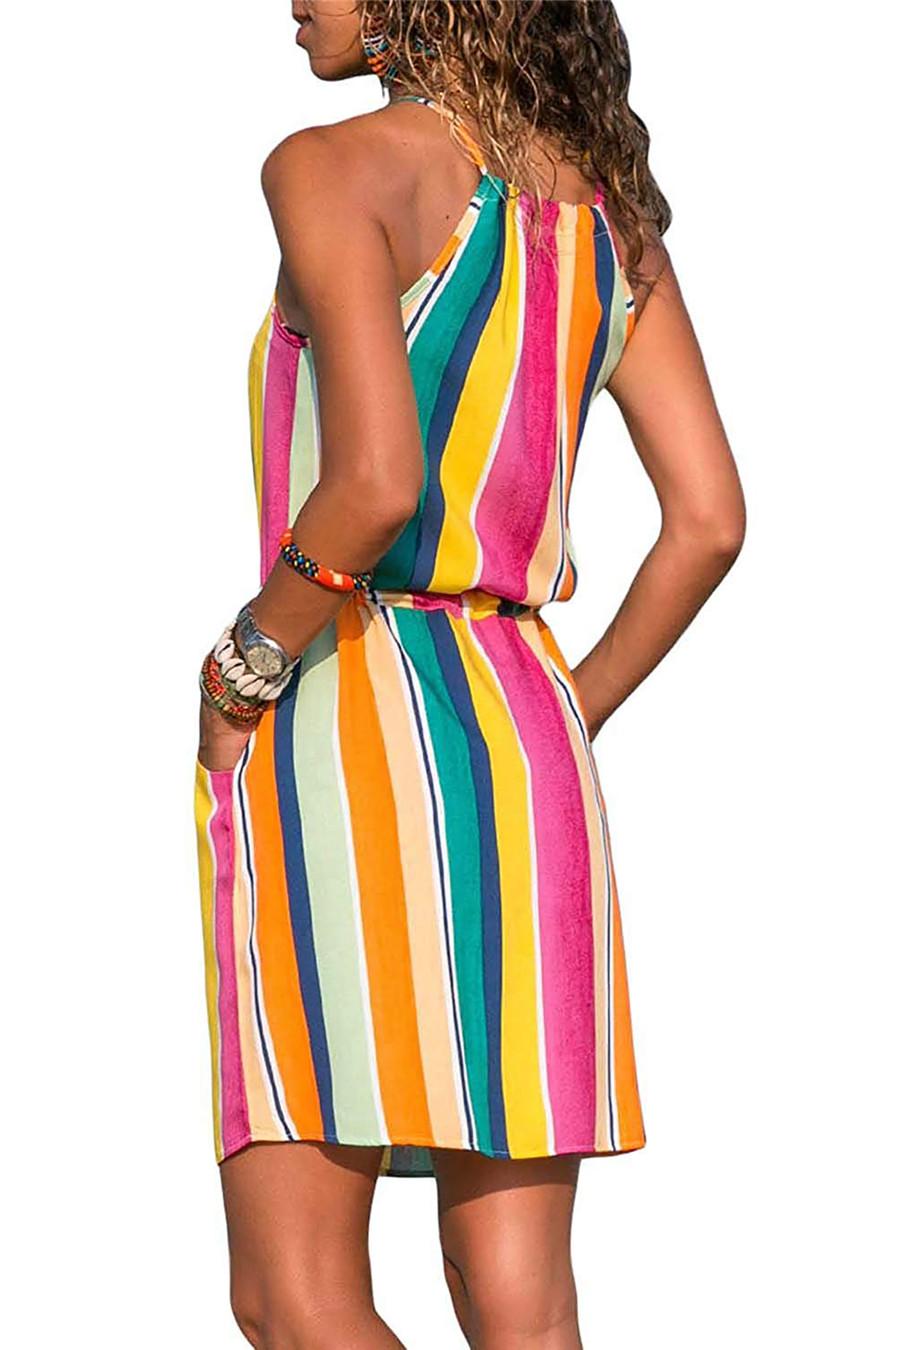 Gladiolus Chiffon Women Summer Dress Spaghetti Strap Floral Print Pocket Sexy Bohemian Beach Dress 2019 Short Ladies Dresses (36)